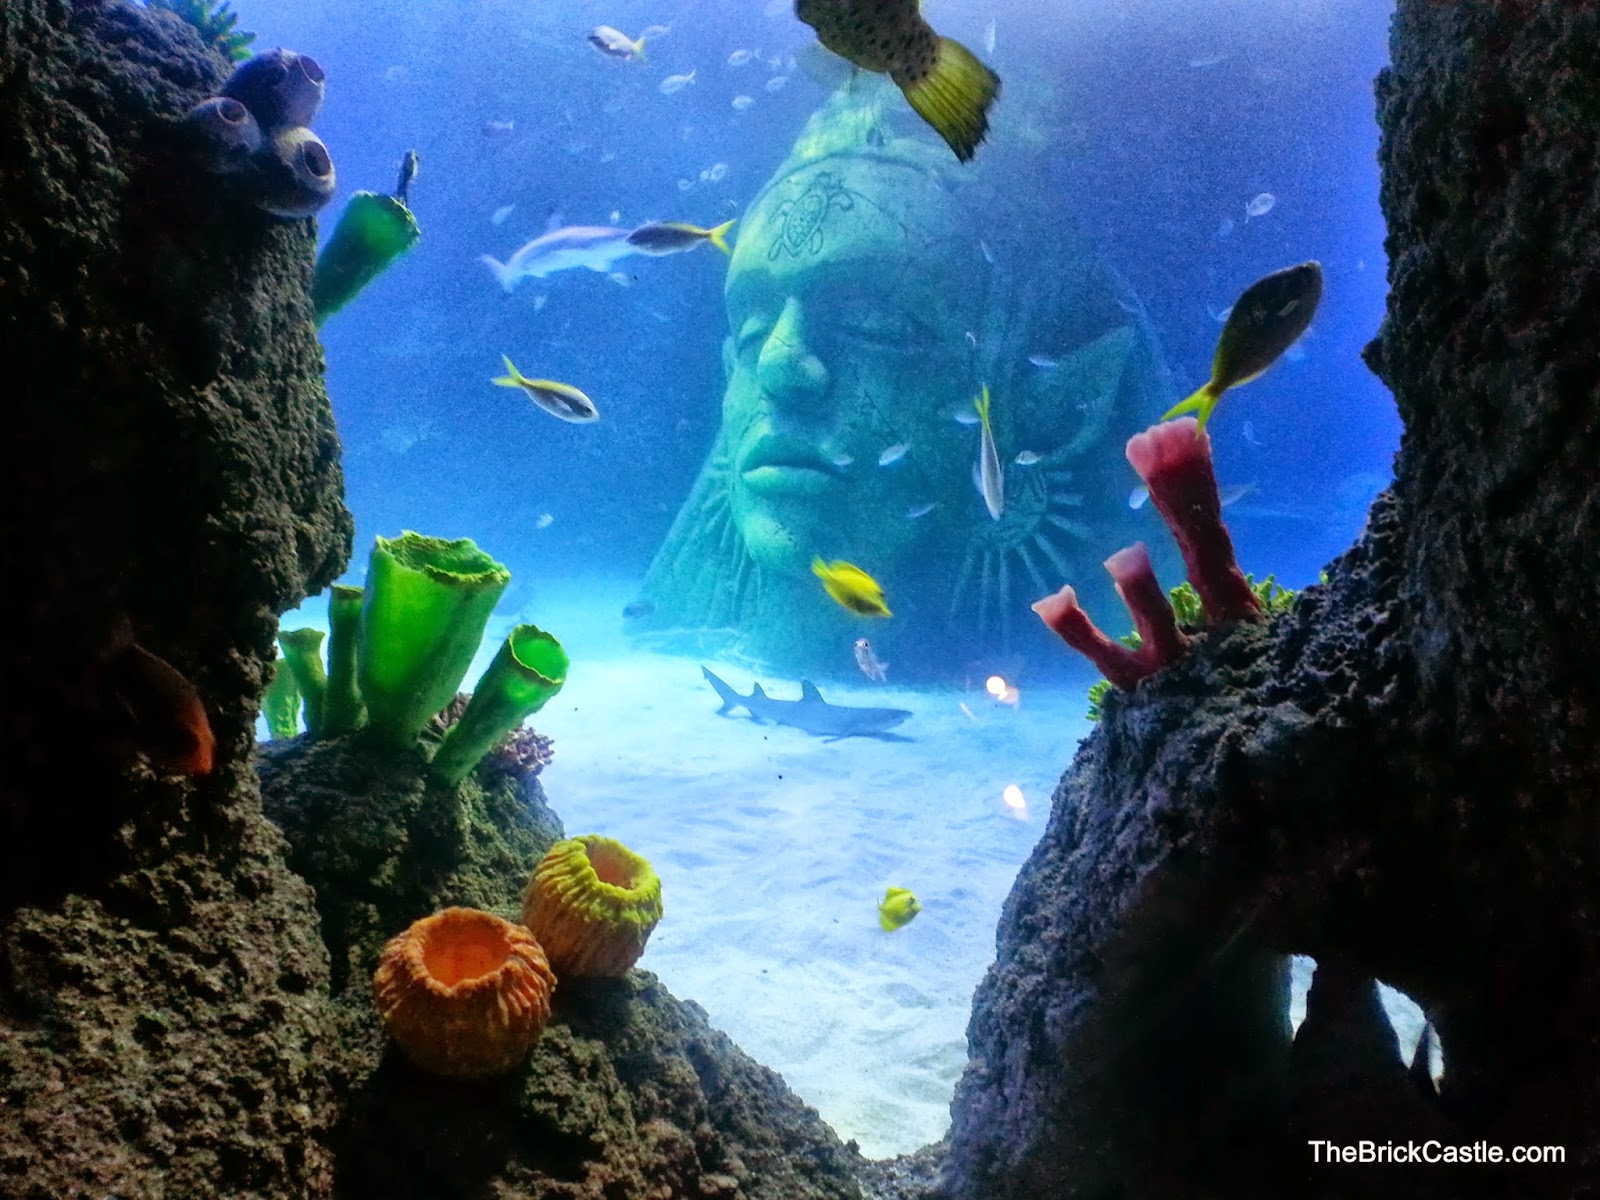 SeaLife Manchester giant stone head inside main tank